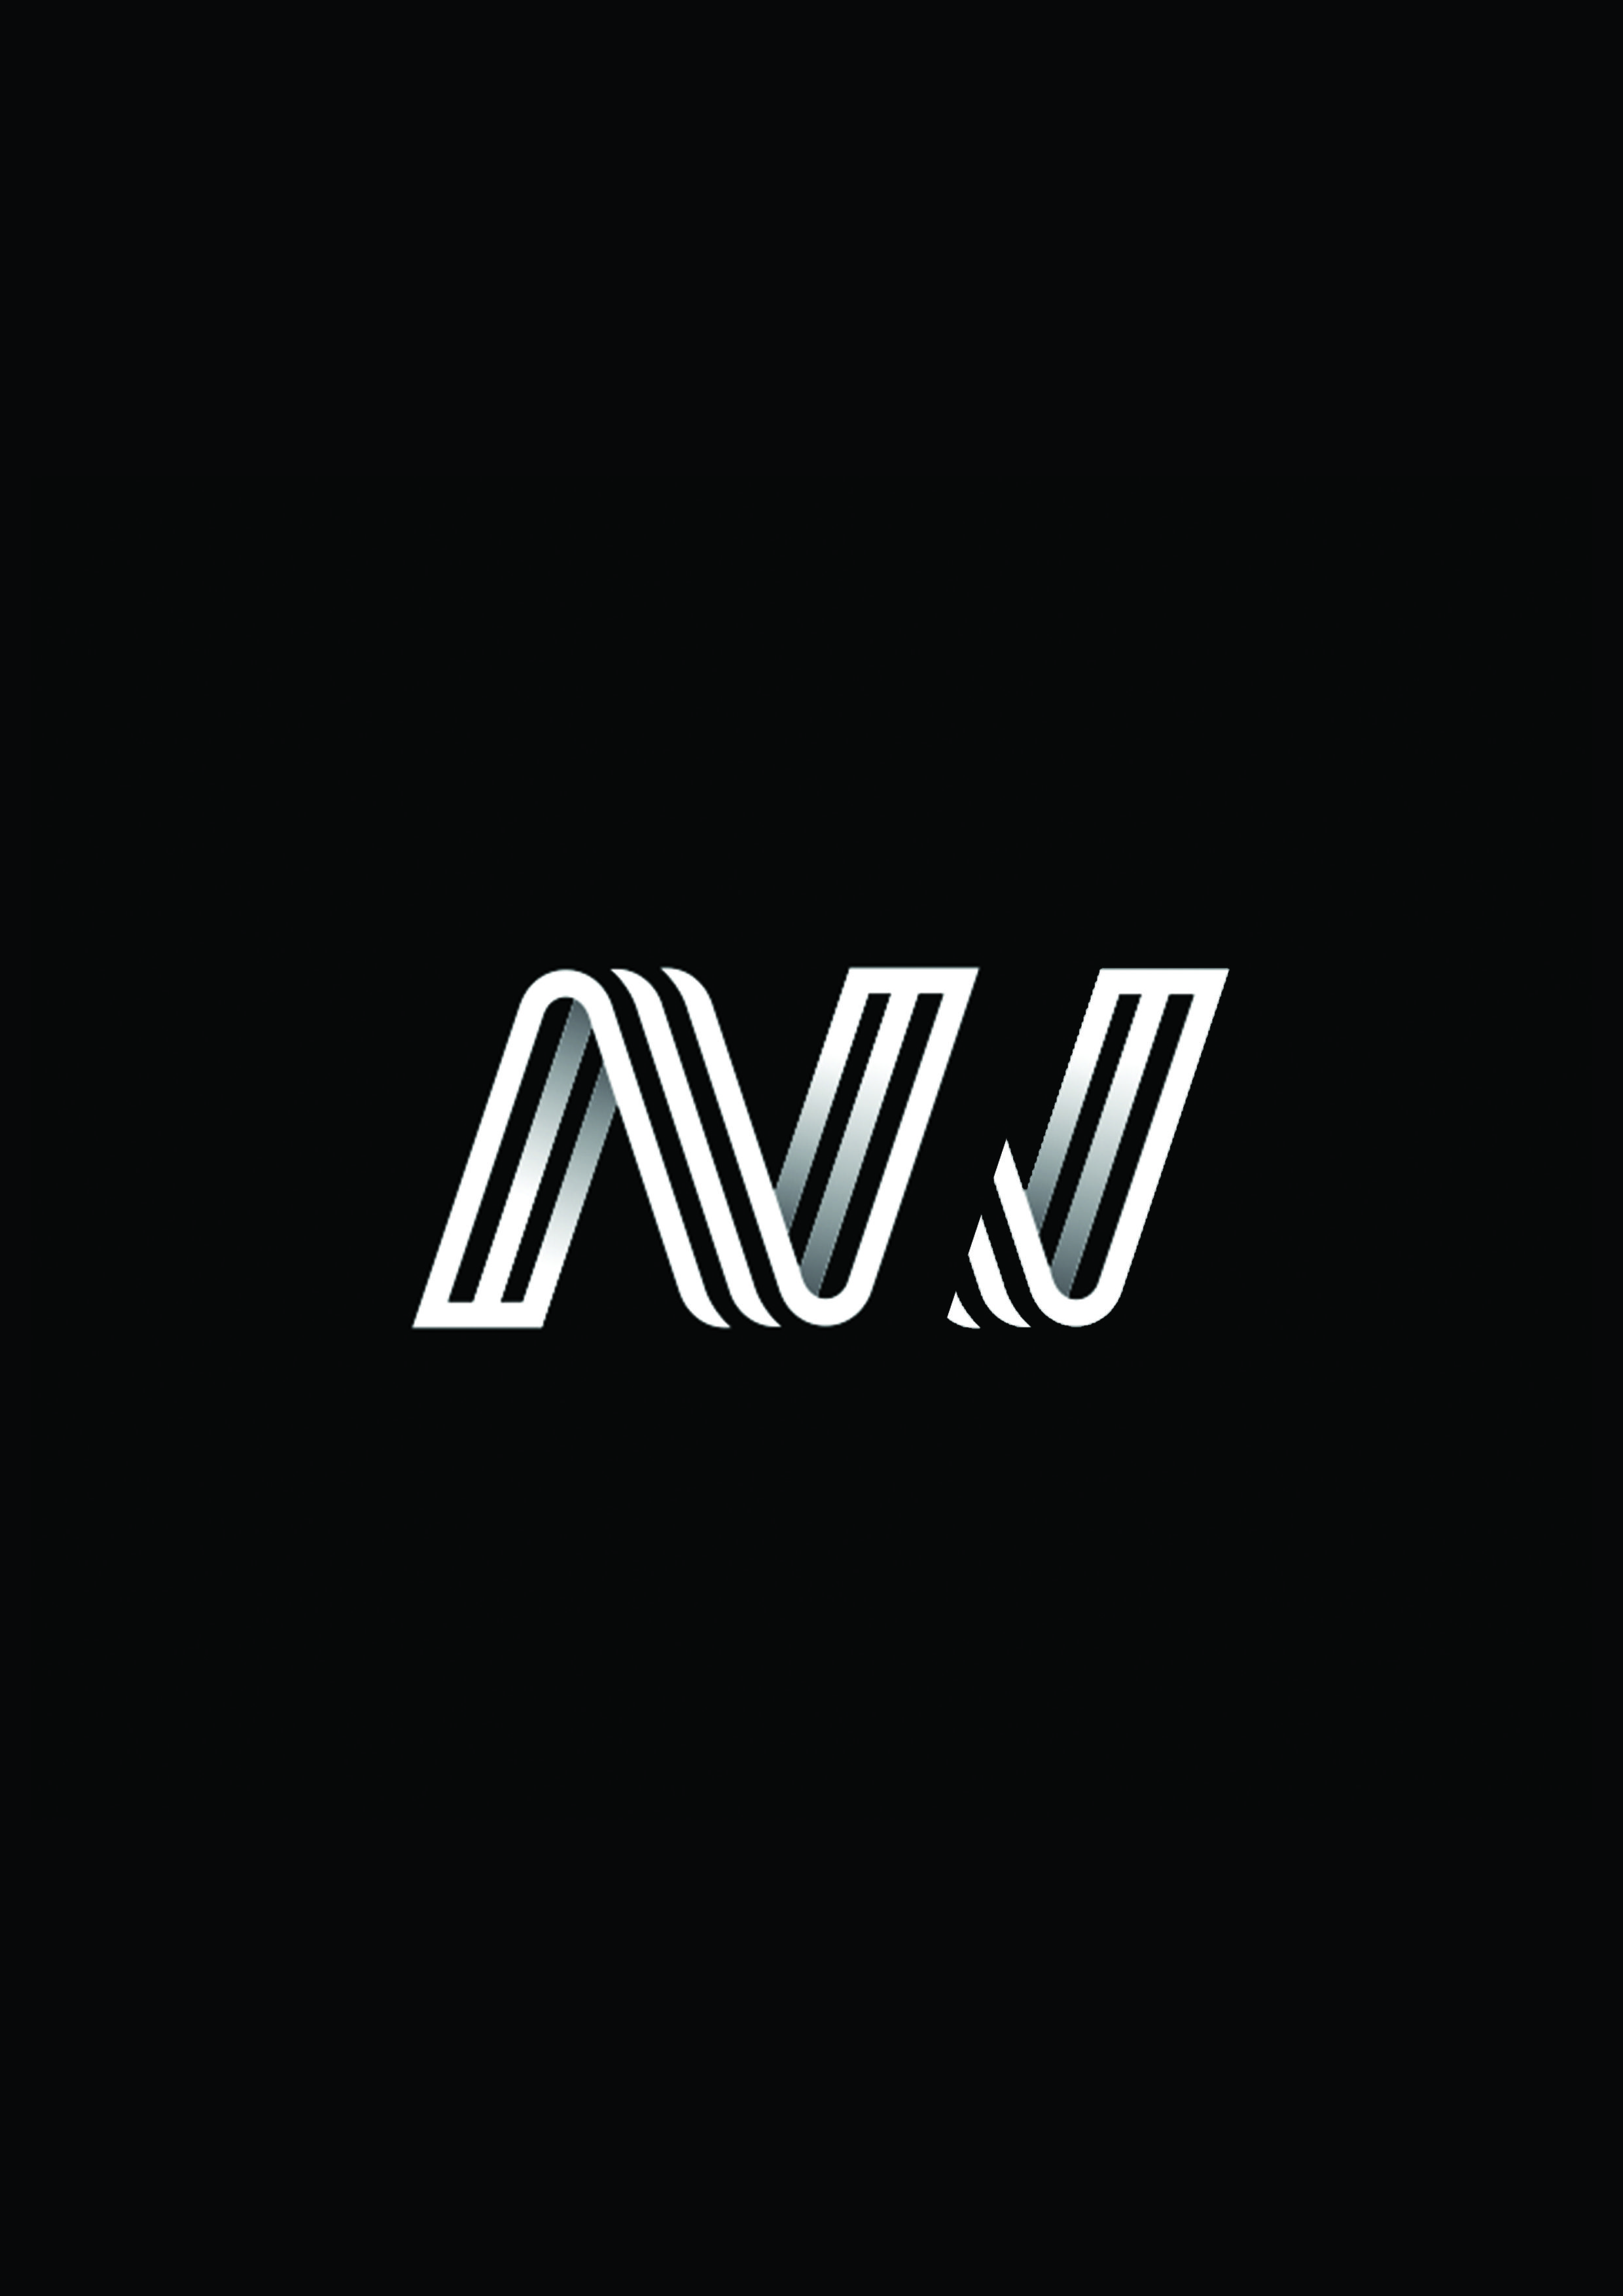 nj logo ดีไซน์